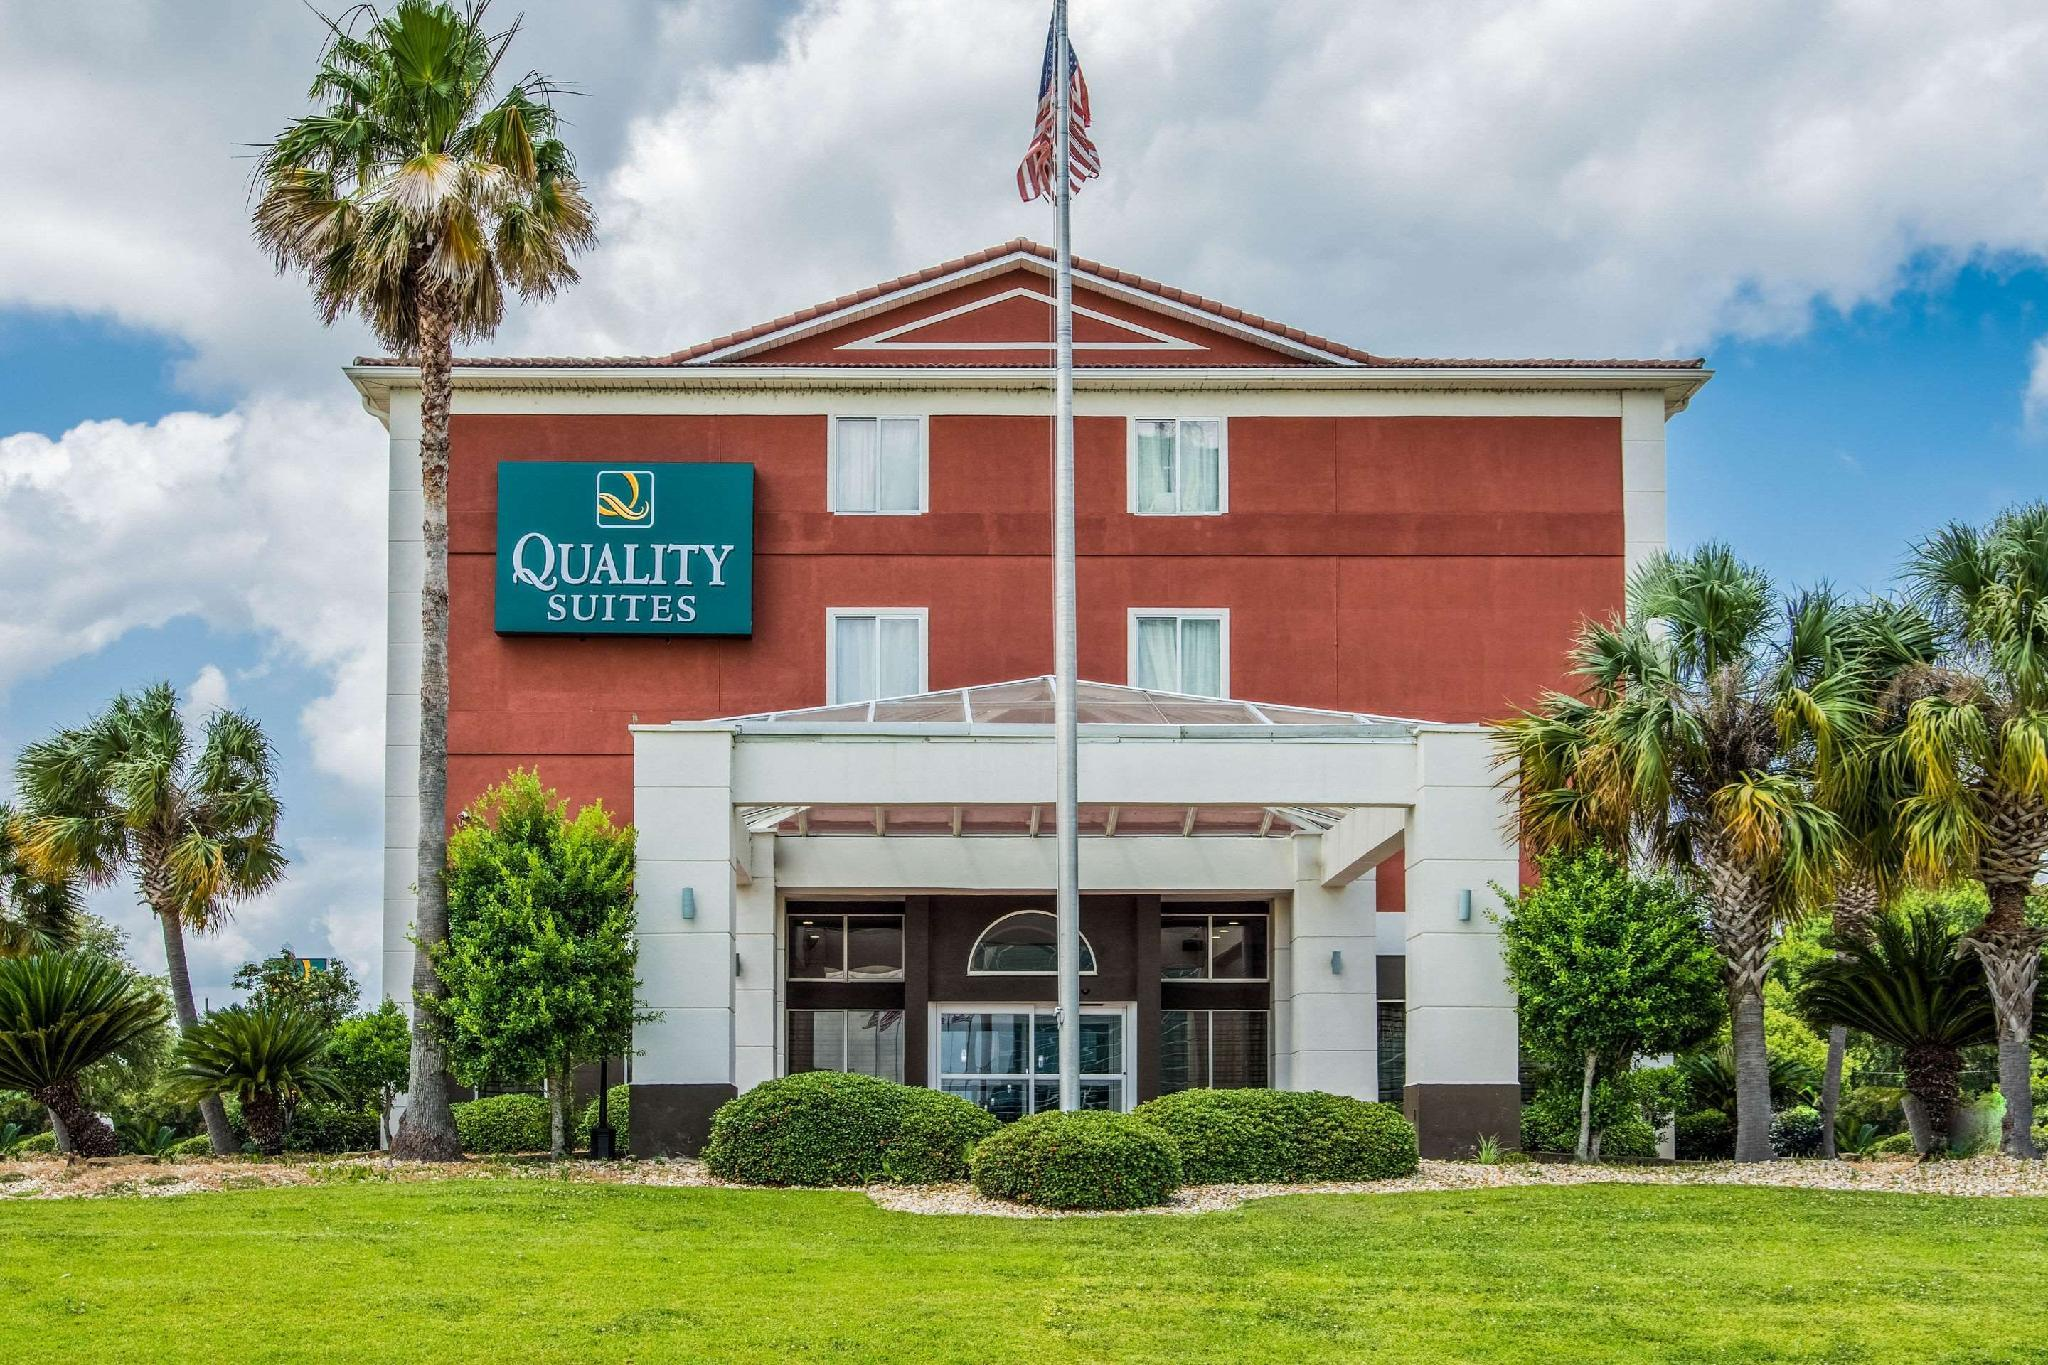 Quality Suites Downtown Convention Center